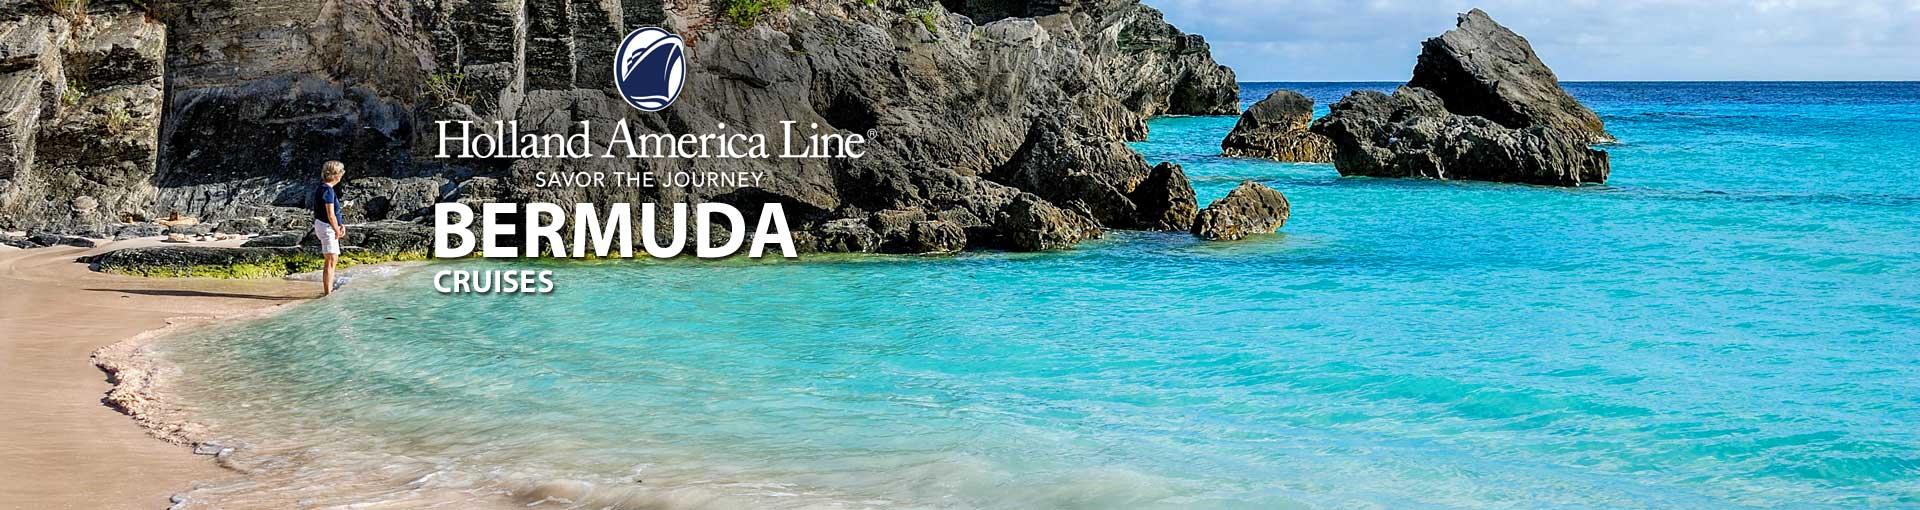 Holland America Bermuda Cruises